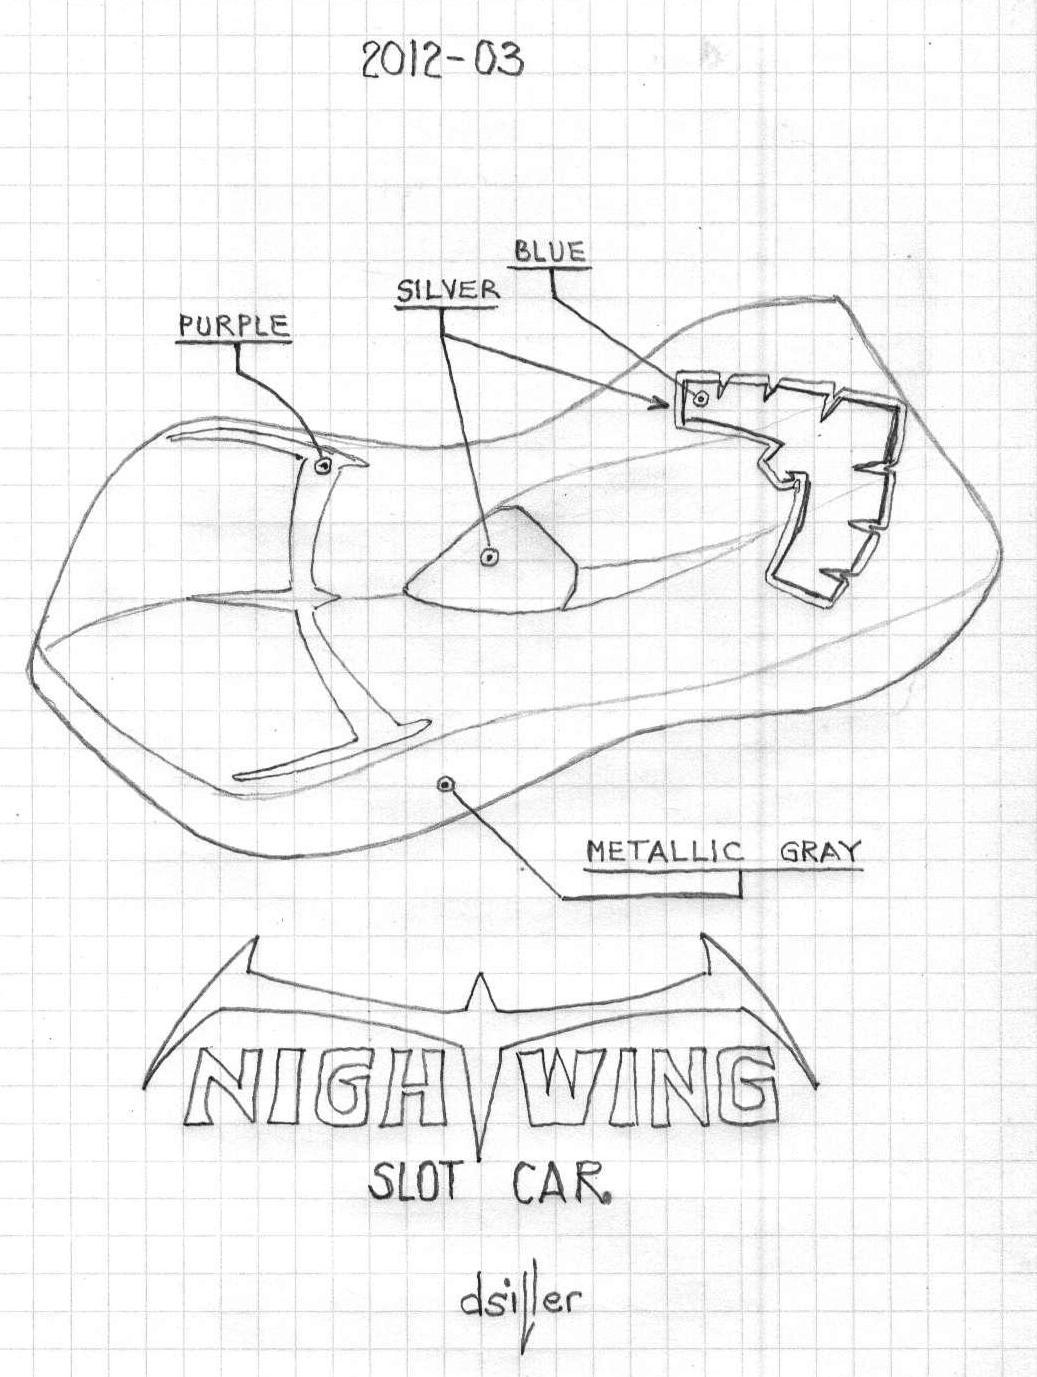 Nightwing 01B.jpg